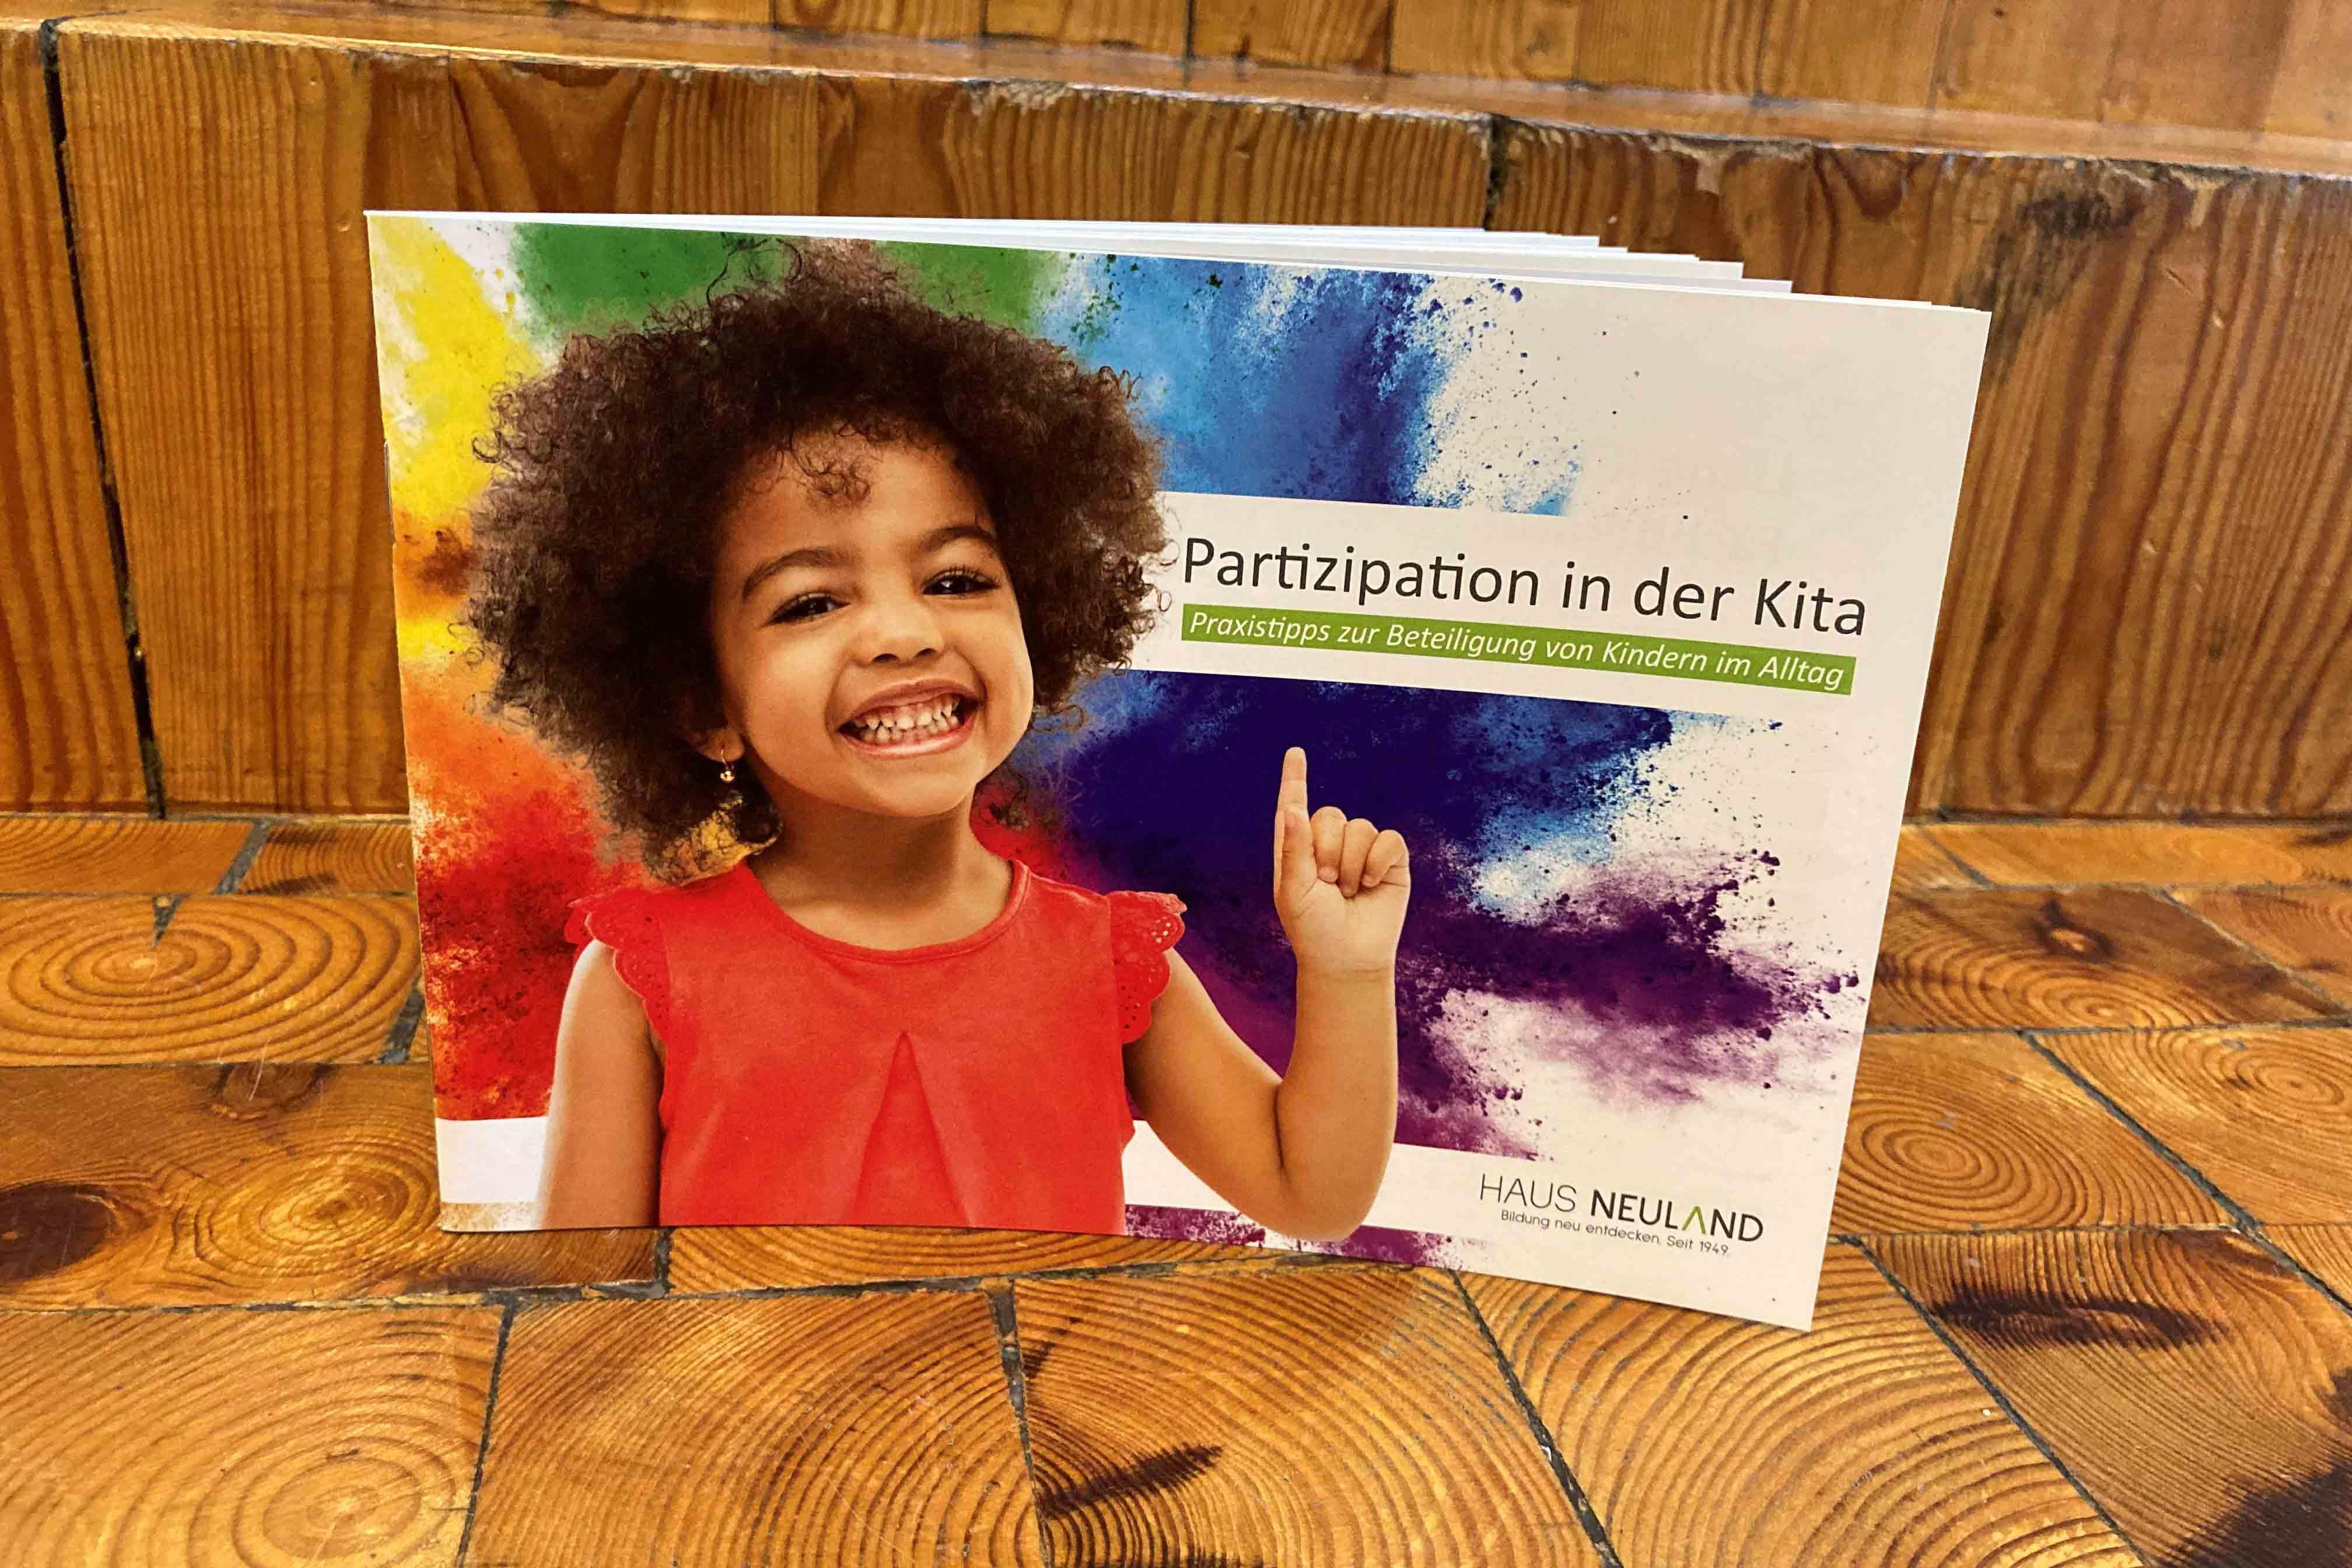 Broschüre zum Projekt Parti